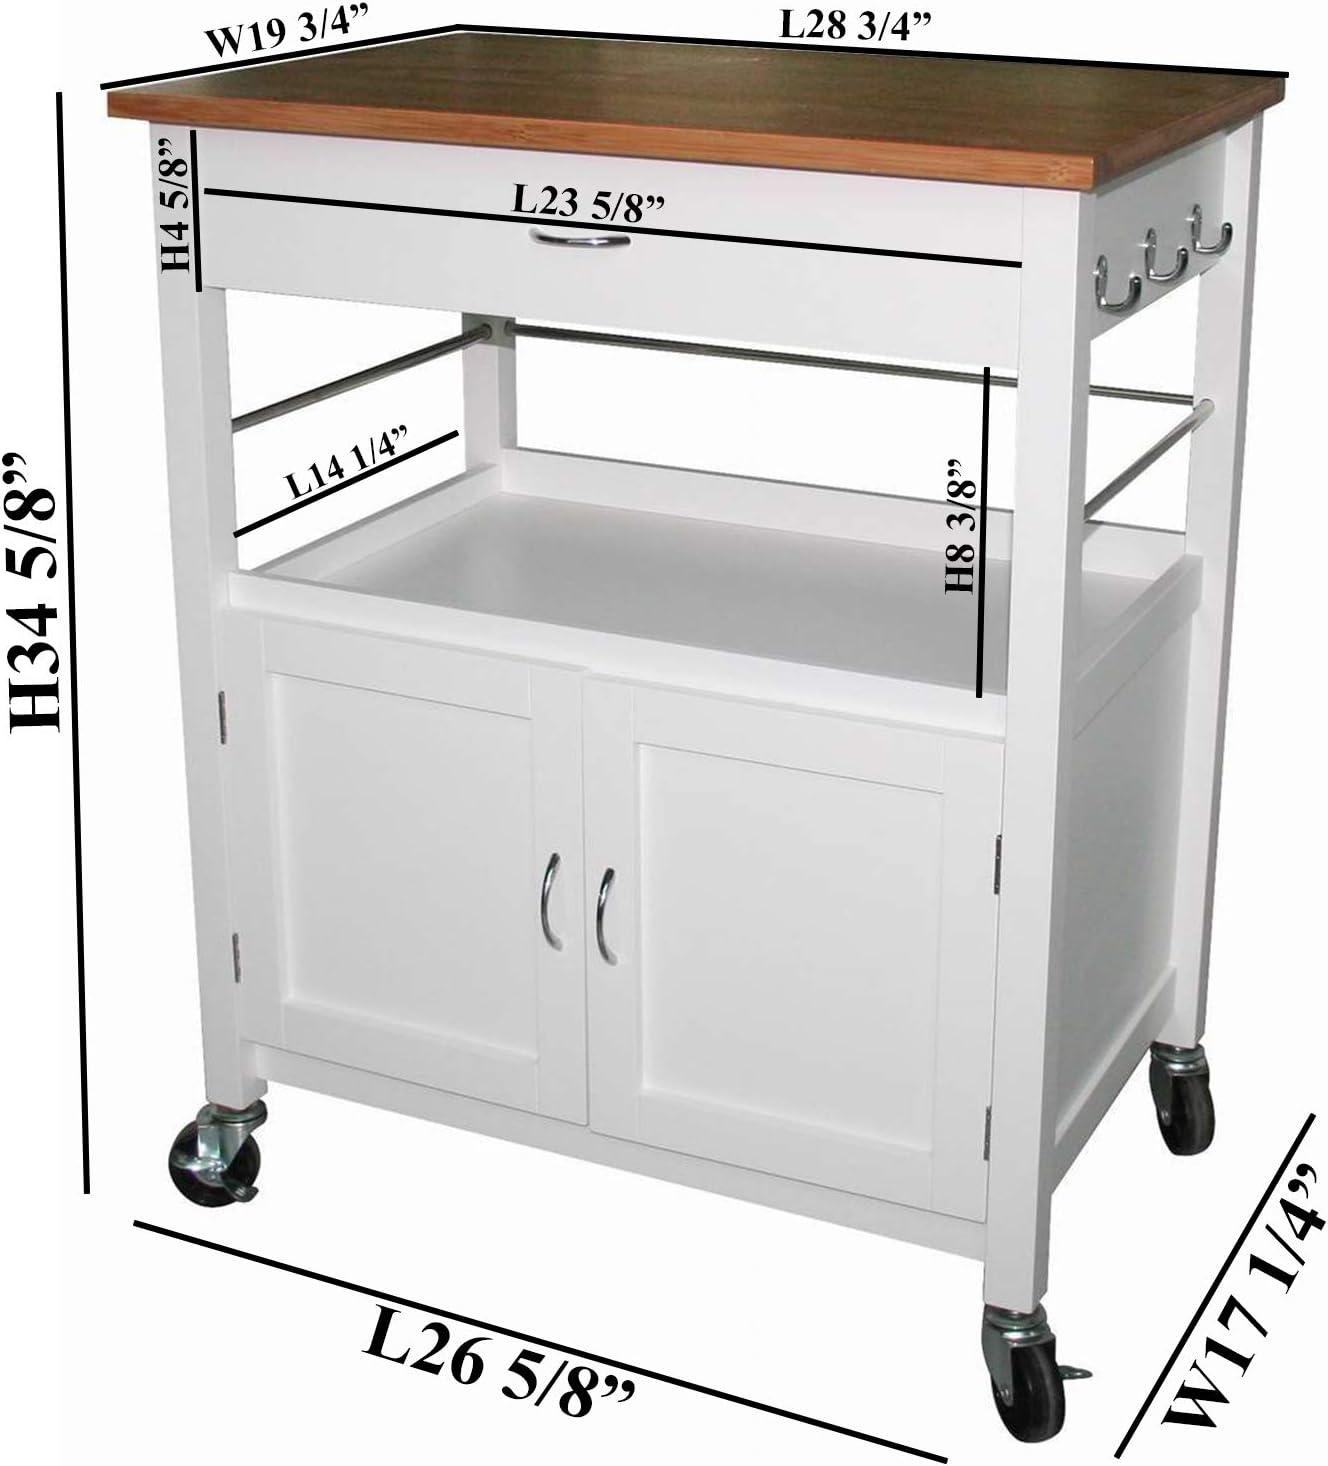 White Kitchen Microwave Cart With Butcher Block Top Locking Casters Kitchen Carts Home Garden